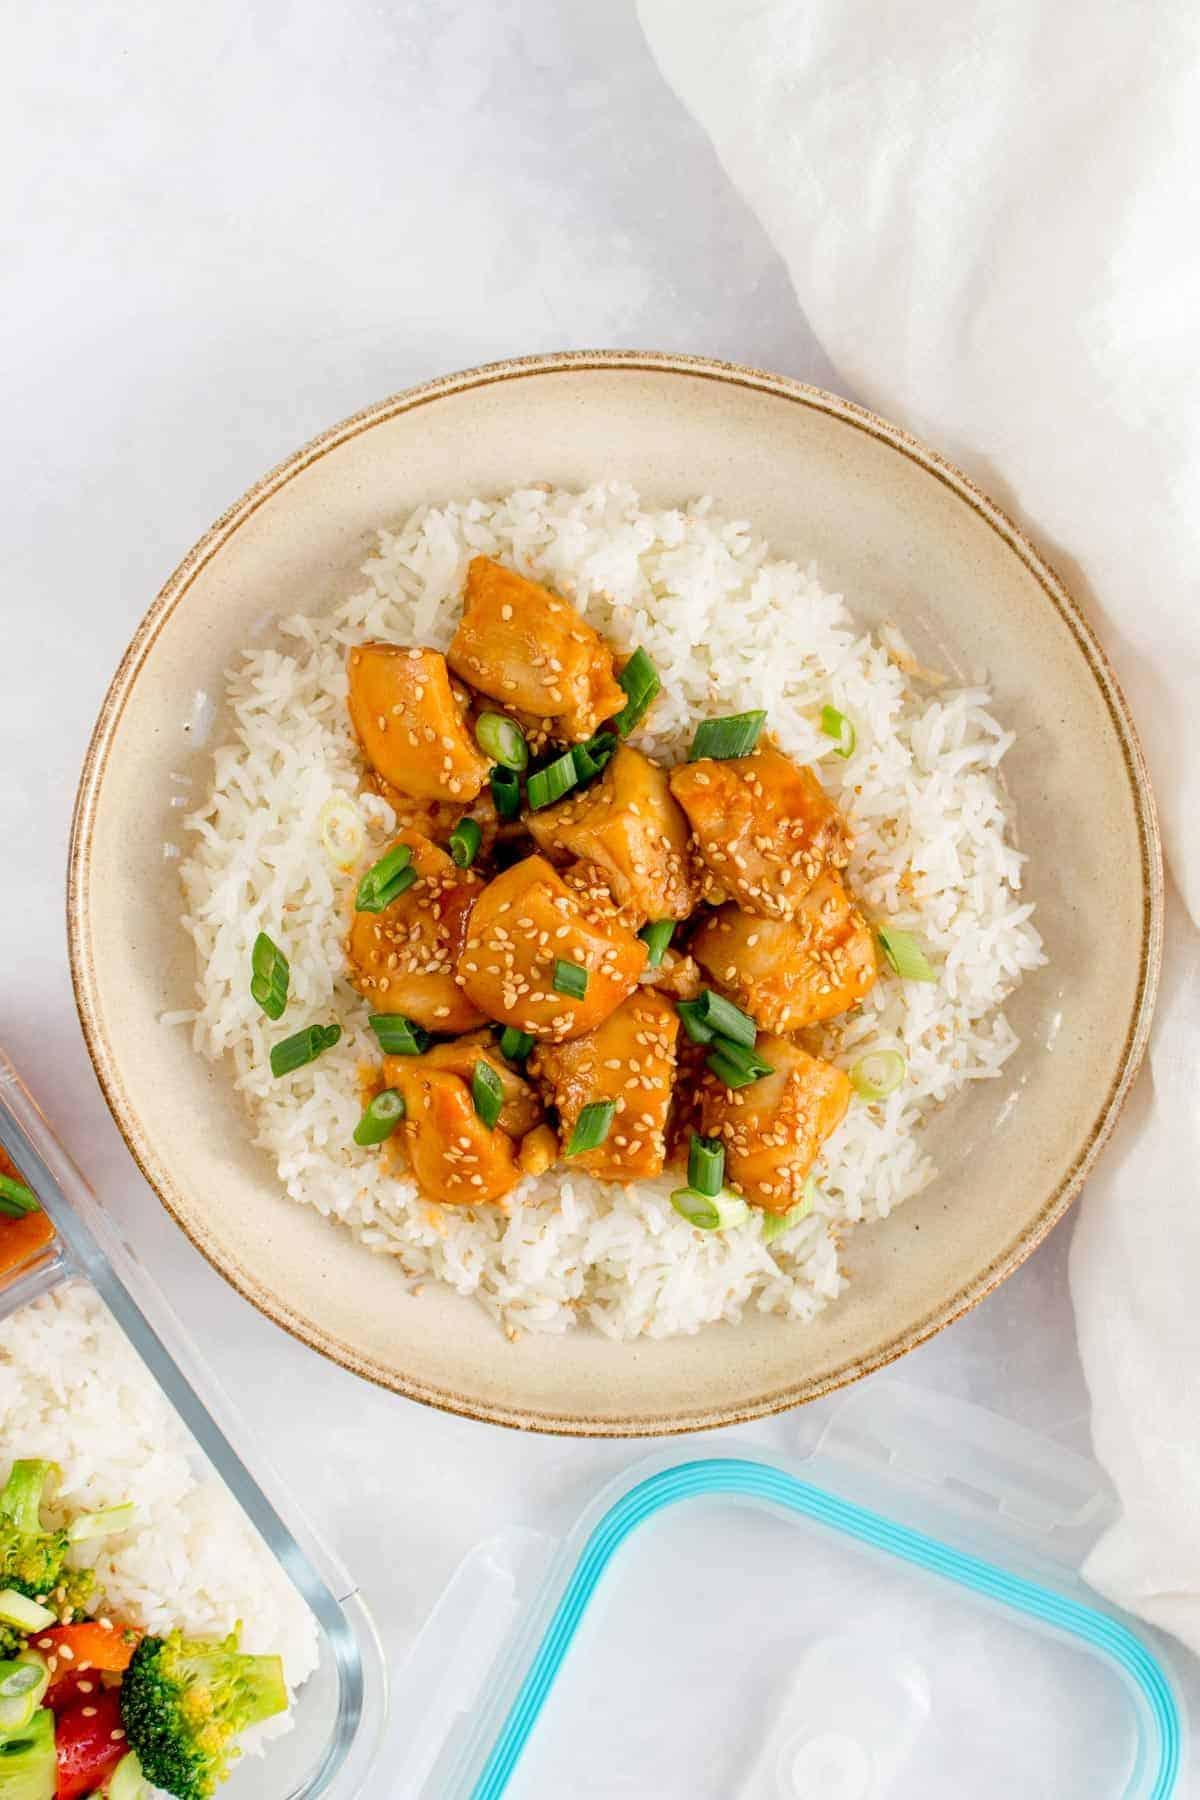 A plate of sesame chicken.